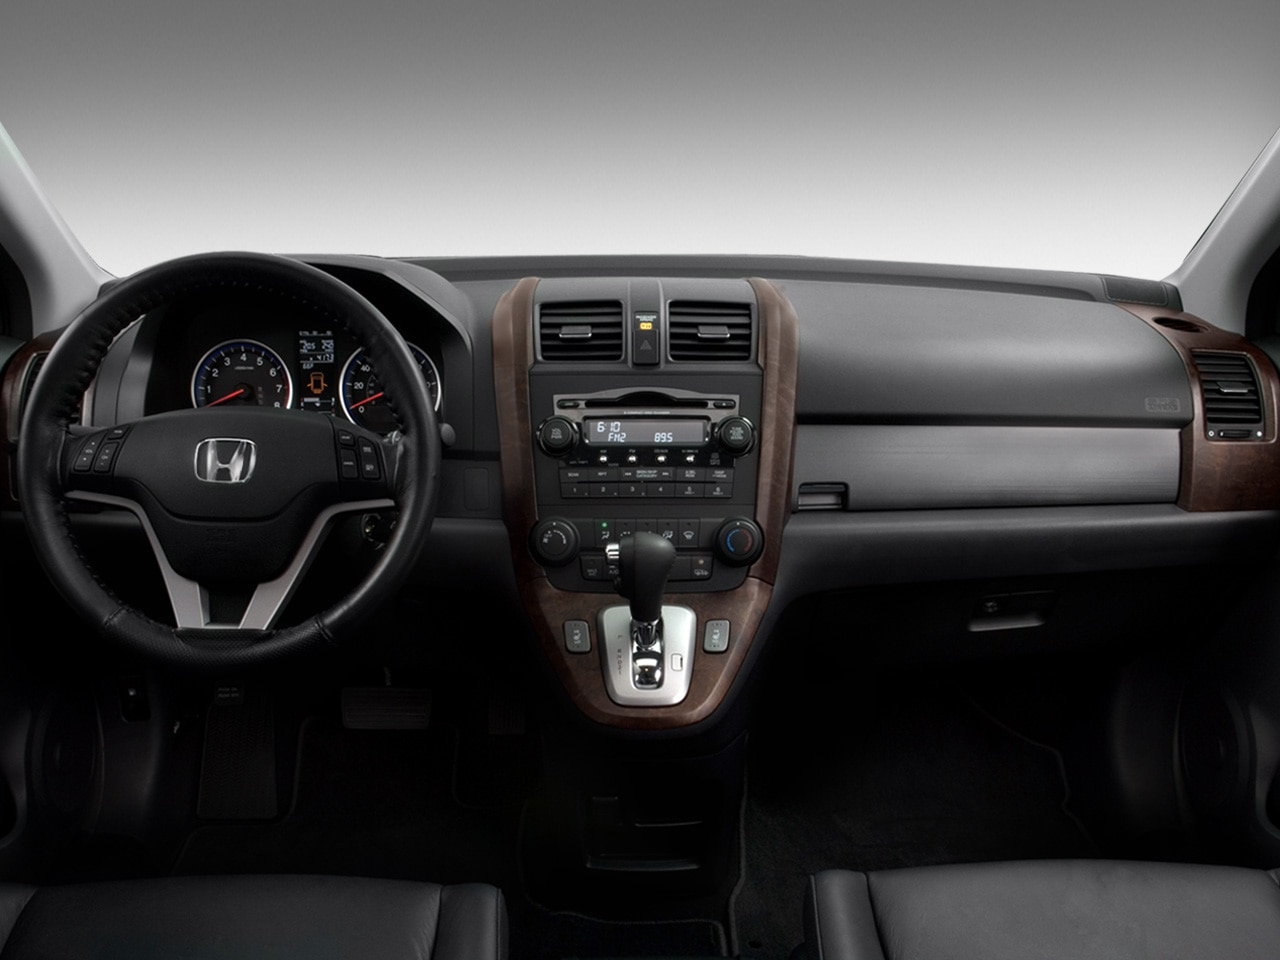 2008 Honda Civic Radio Wiring Diagram 2007 Honda Cr V Reviews Research Cr V Prices Amp Specs